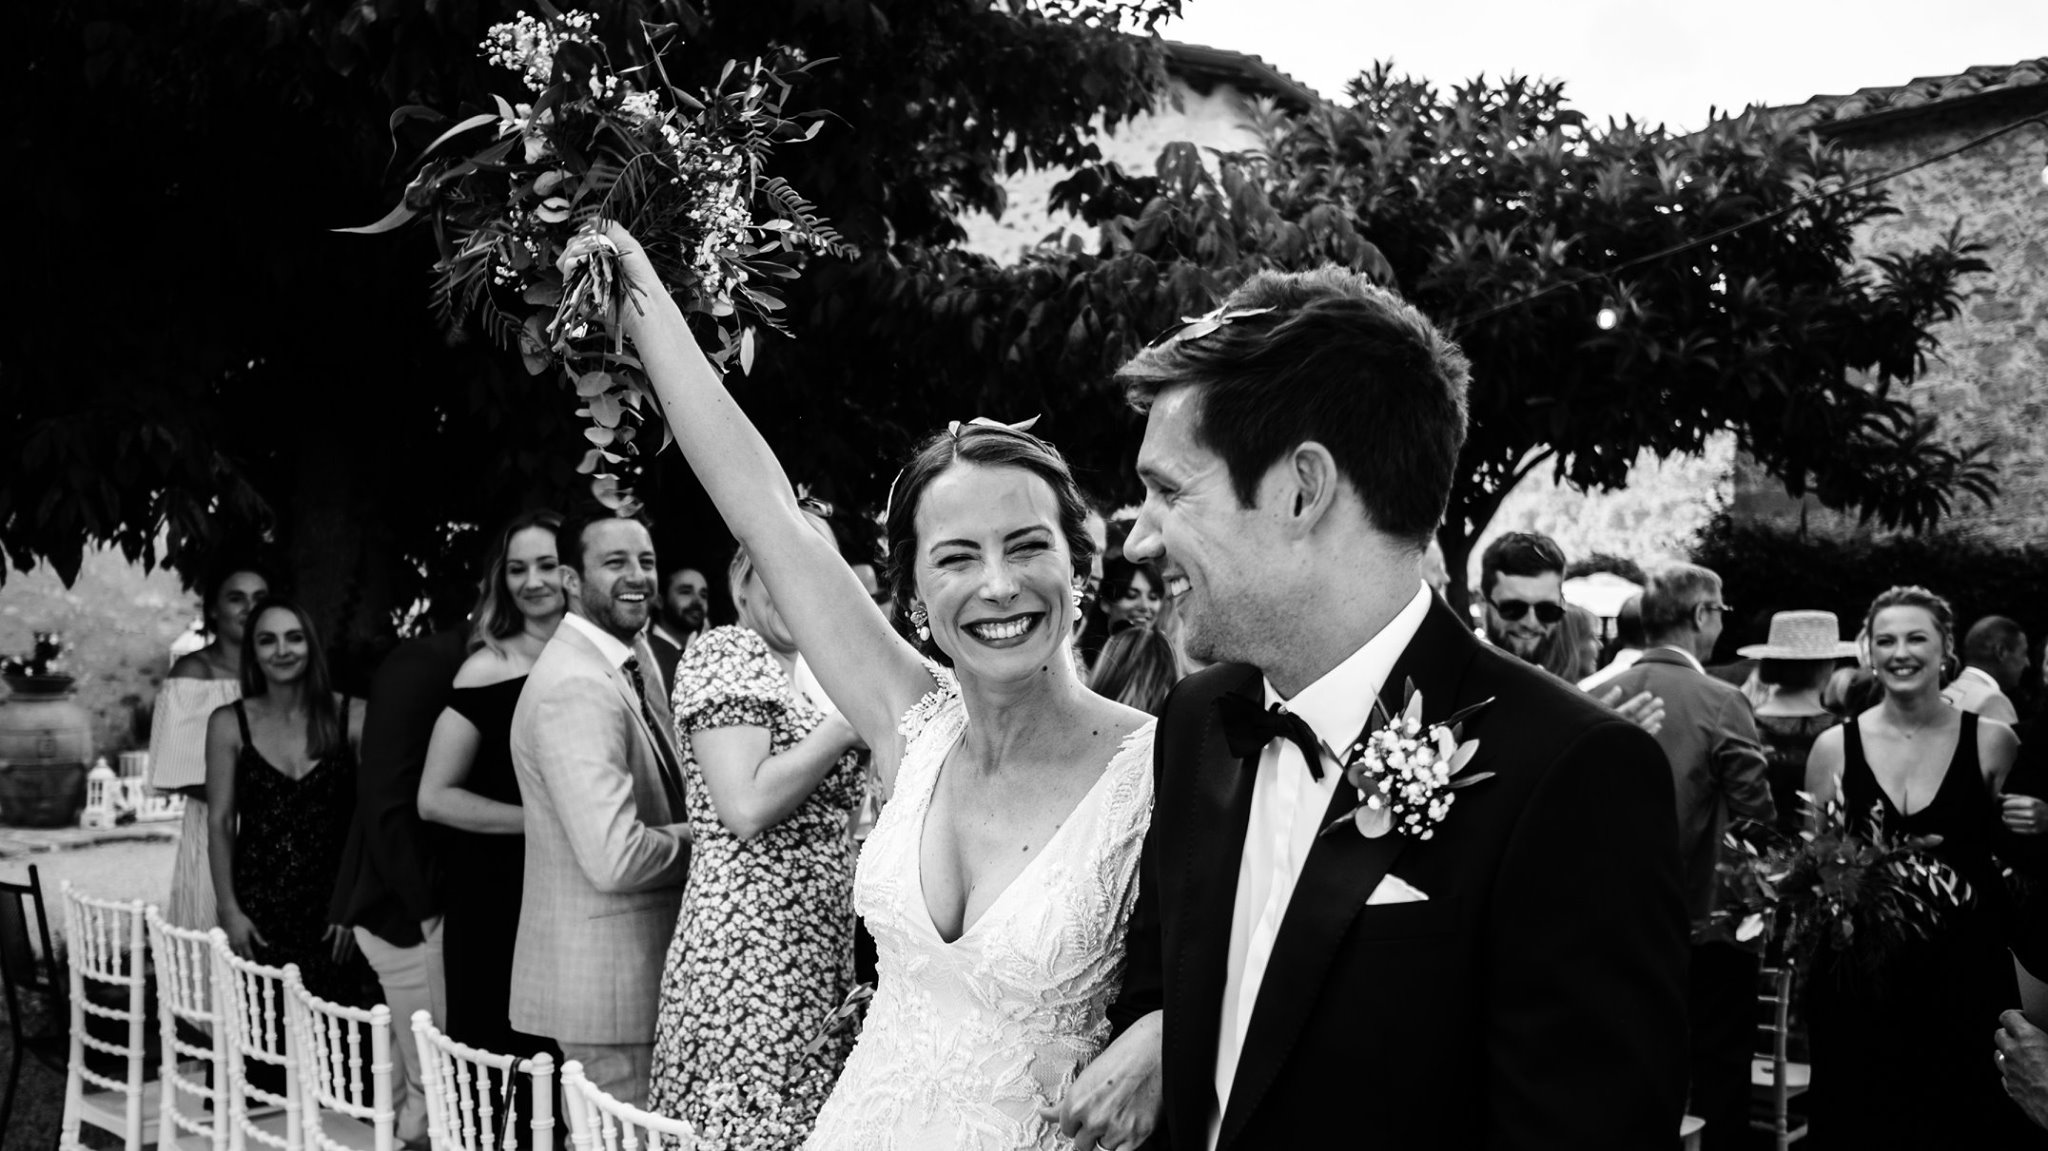 wedding-photography-perugia-italy-borgo